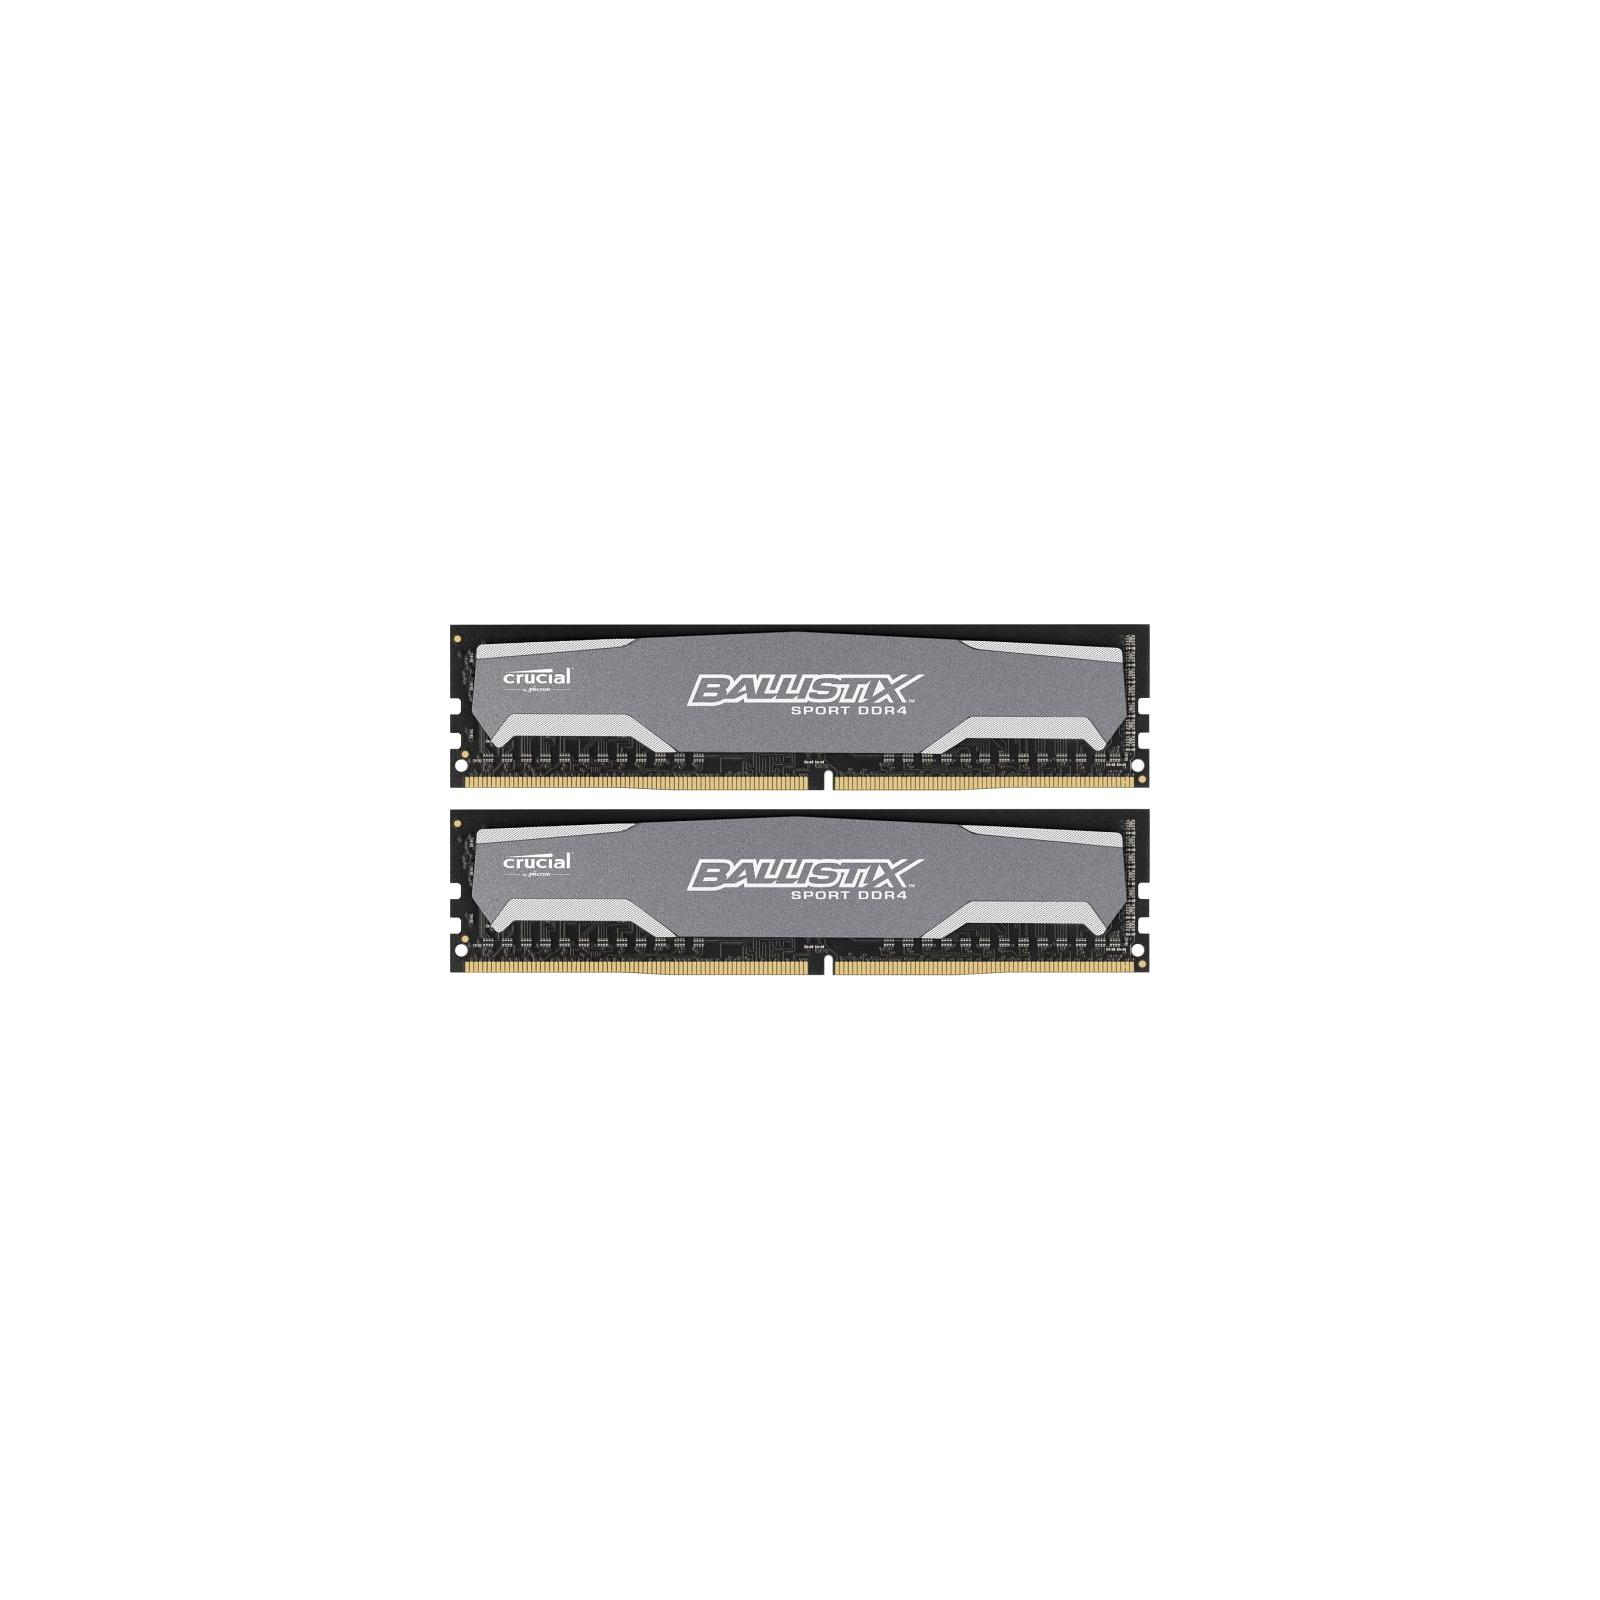 Модуль памяти для компьютера DDR4 16GB (2x8GB) 2400 MHz Ballistix Sport MICRON (BLS2C8G4D240FSA)